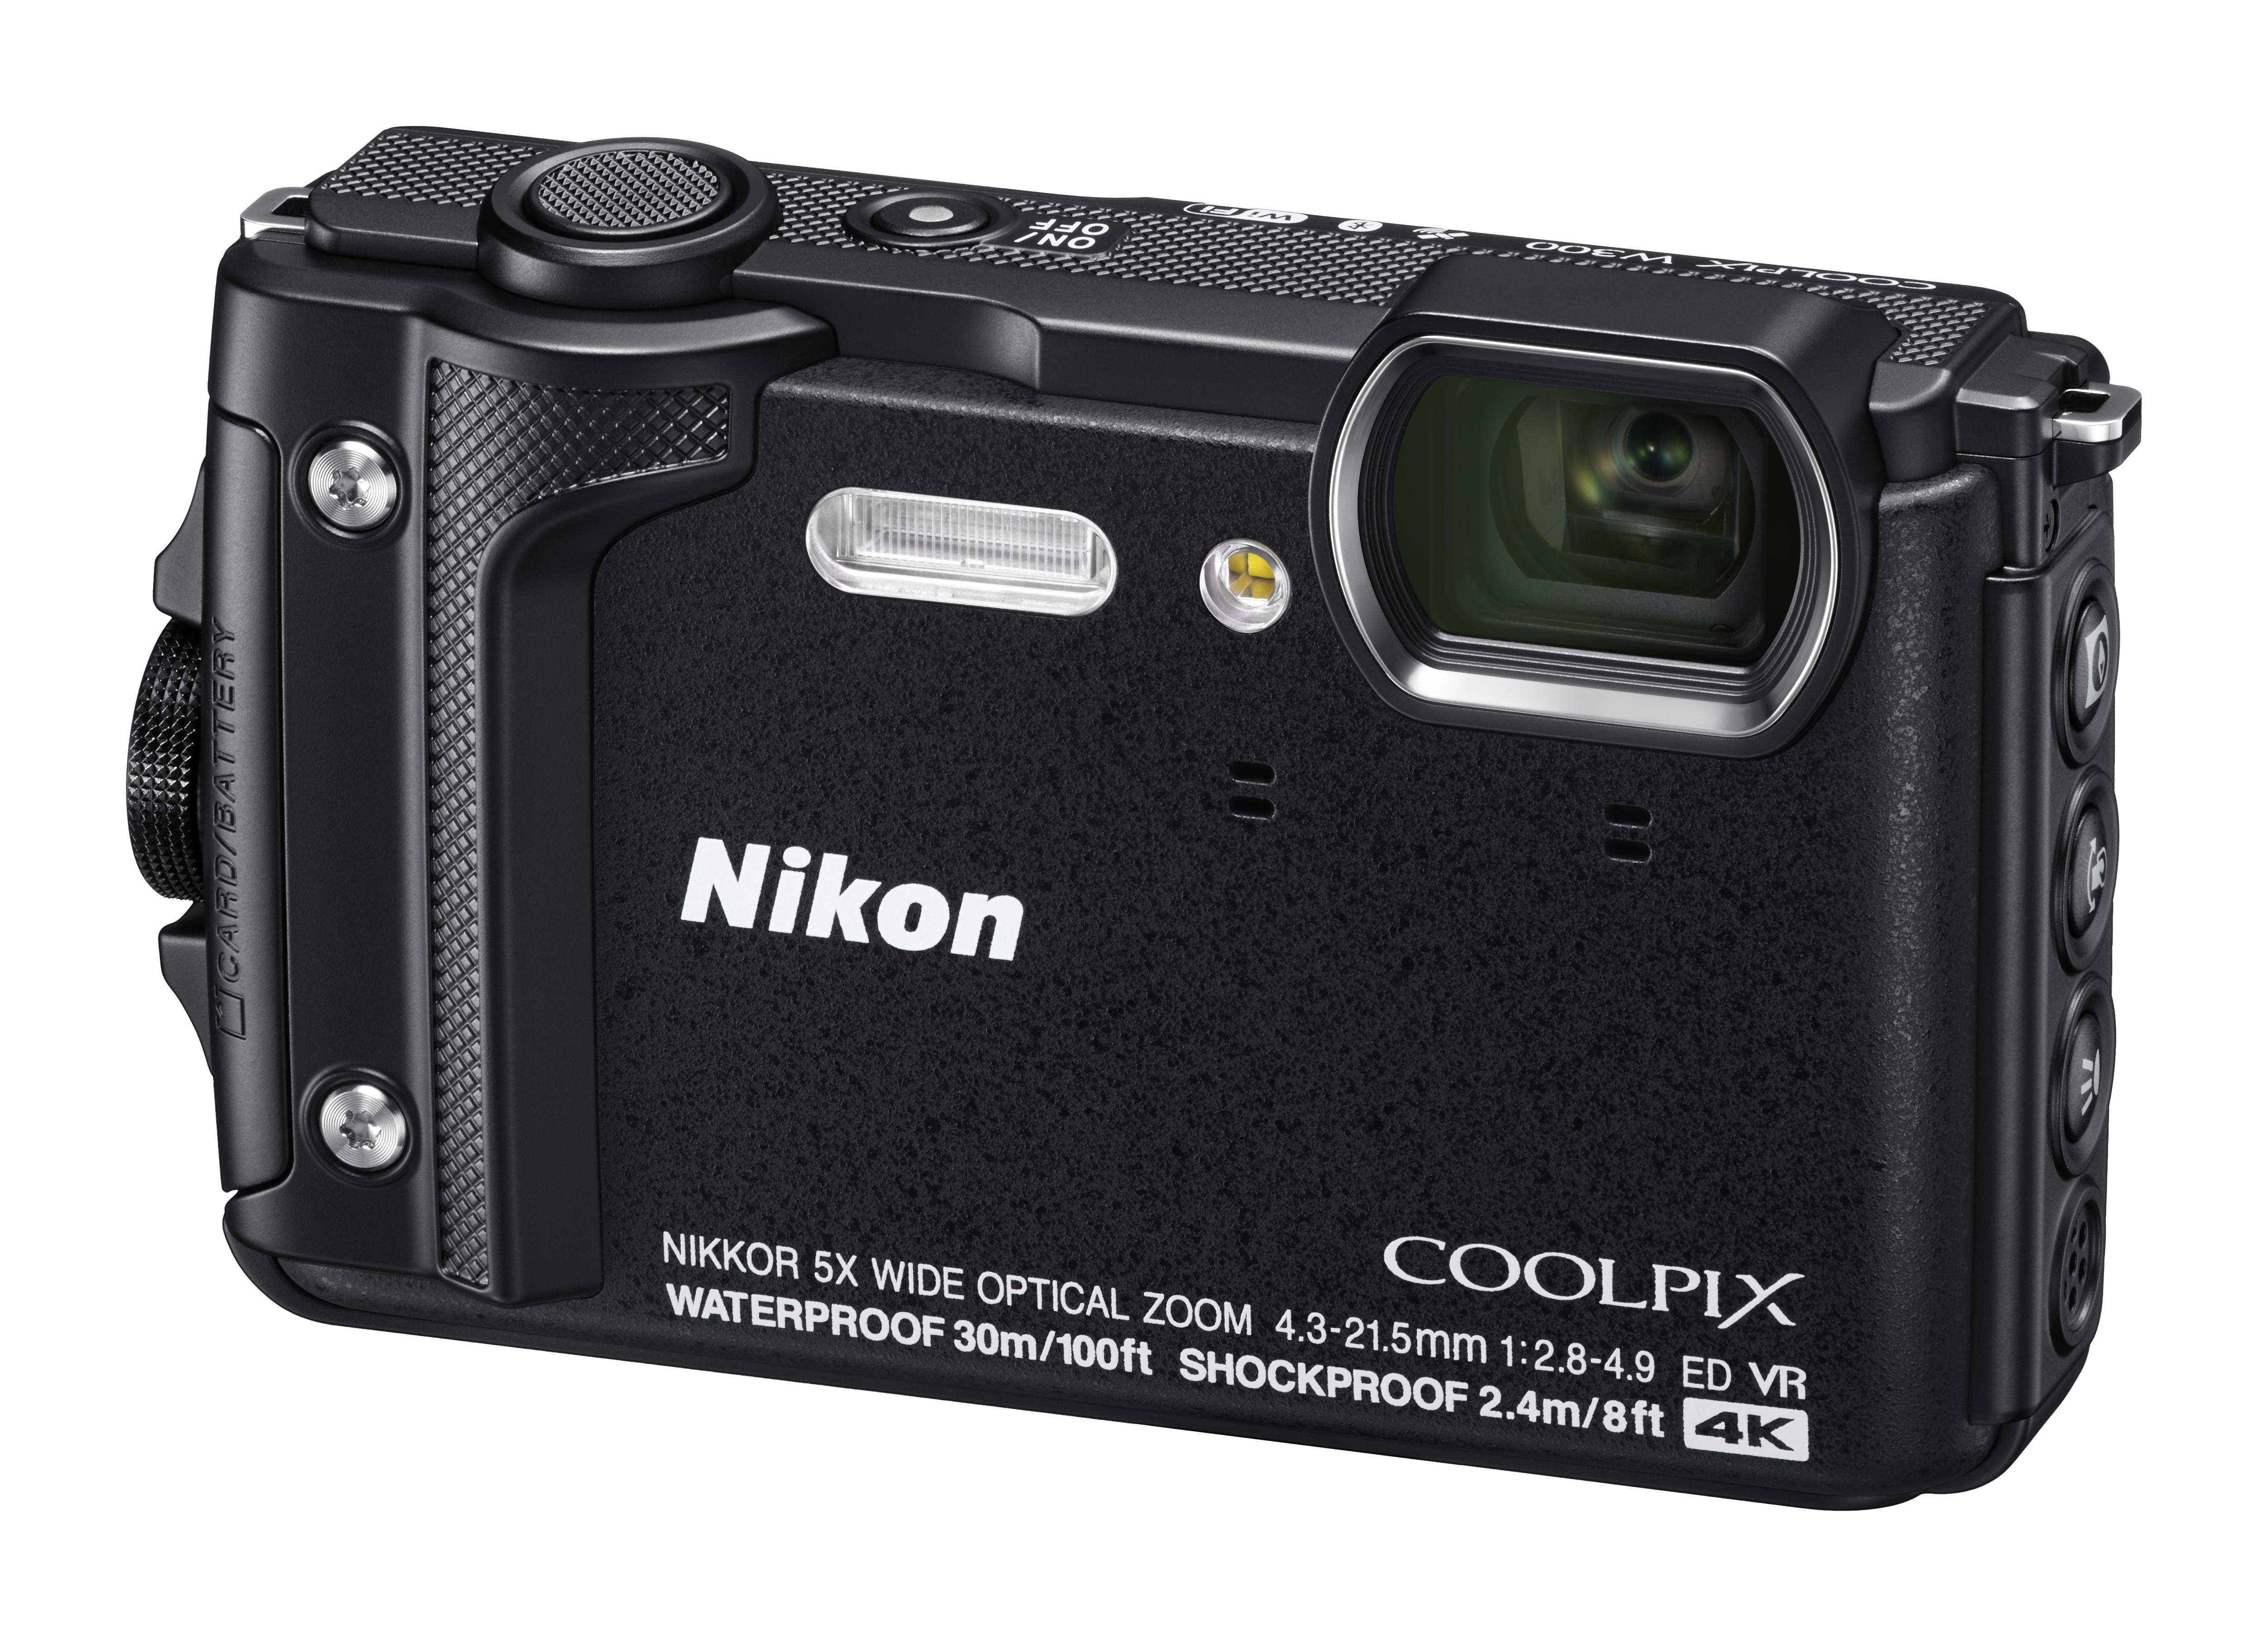 coolpix nikon w300 камера